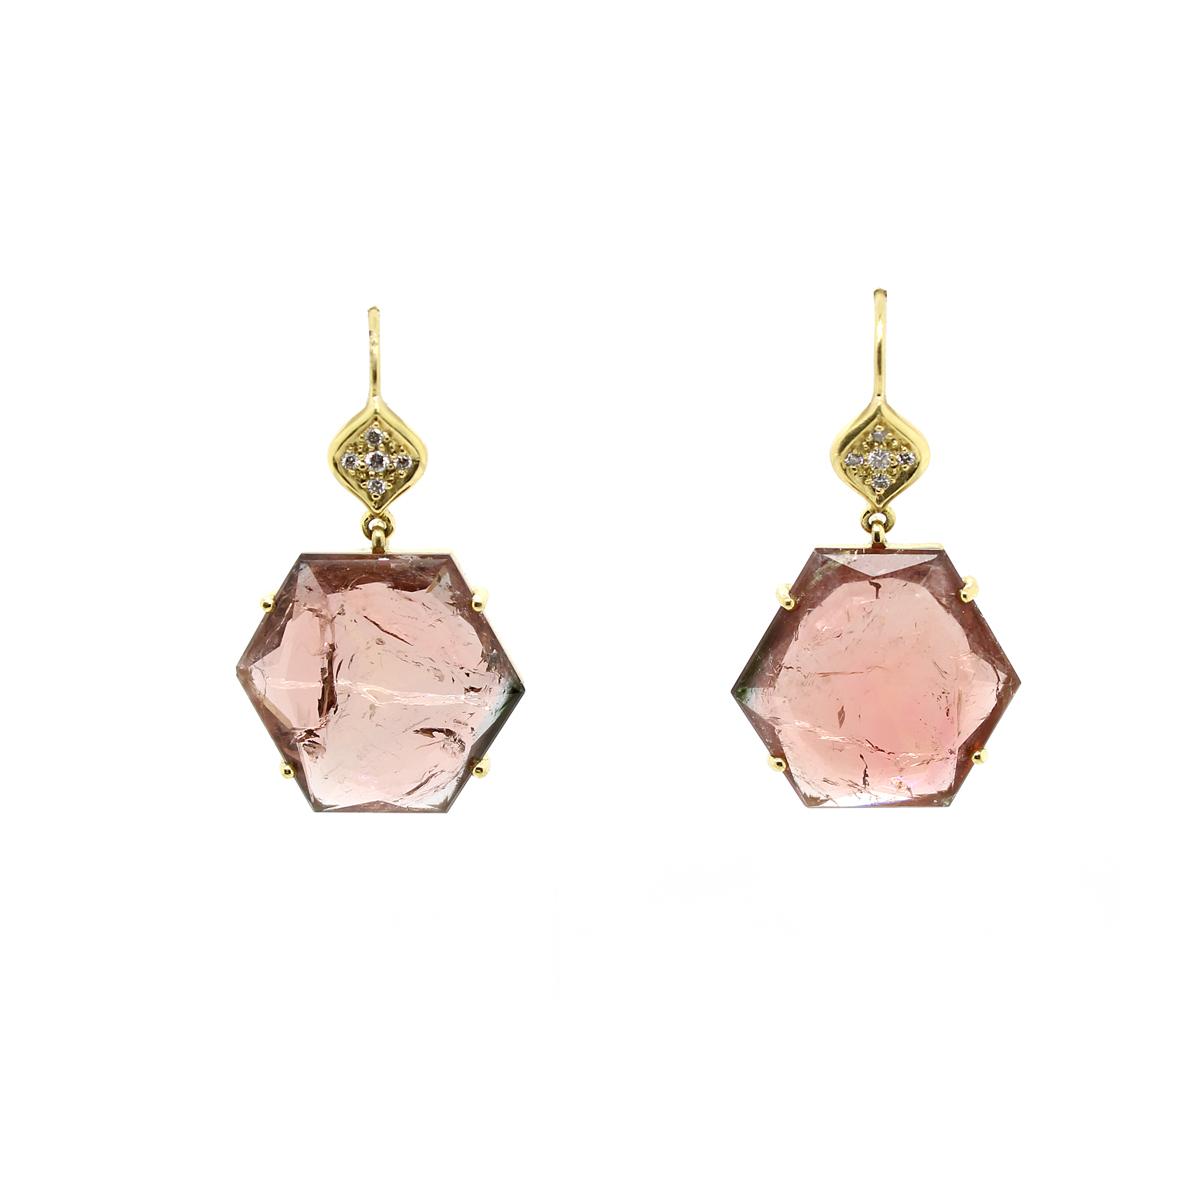 Lauren K 18 Karat Yellow Gold Tourmaline and Diamond Petra Earrings